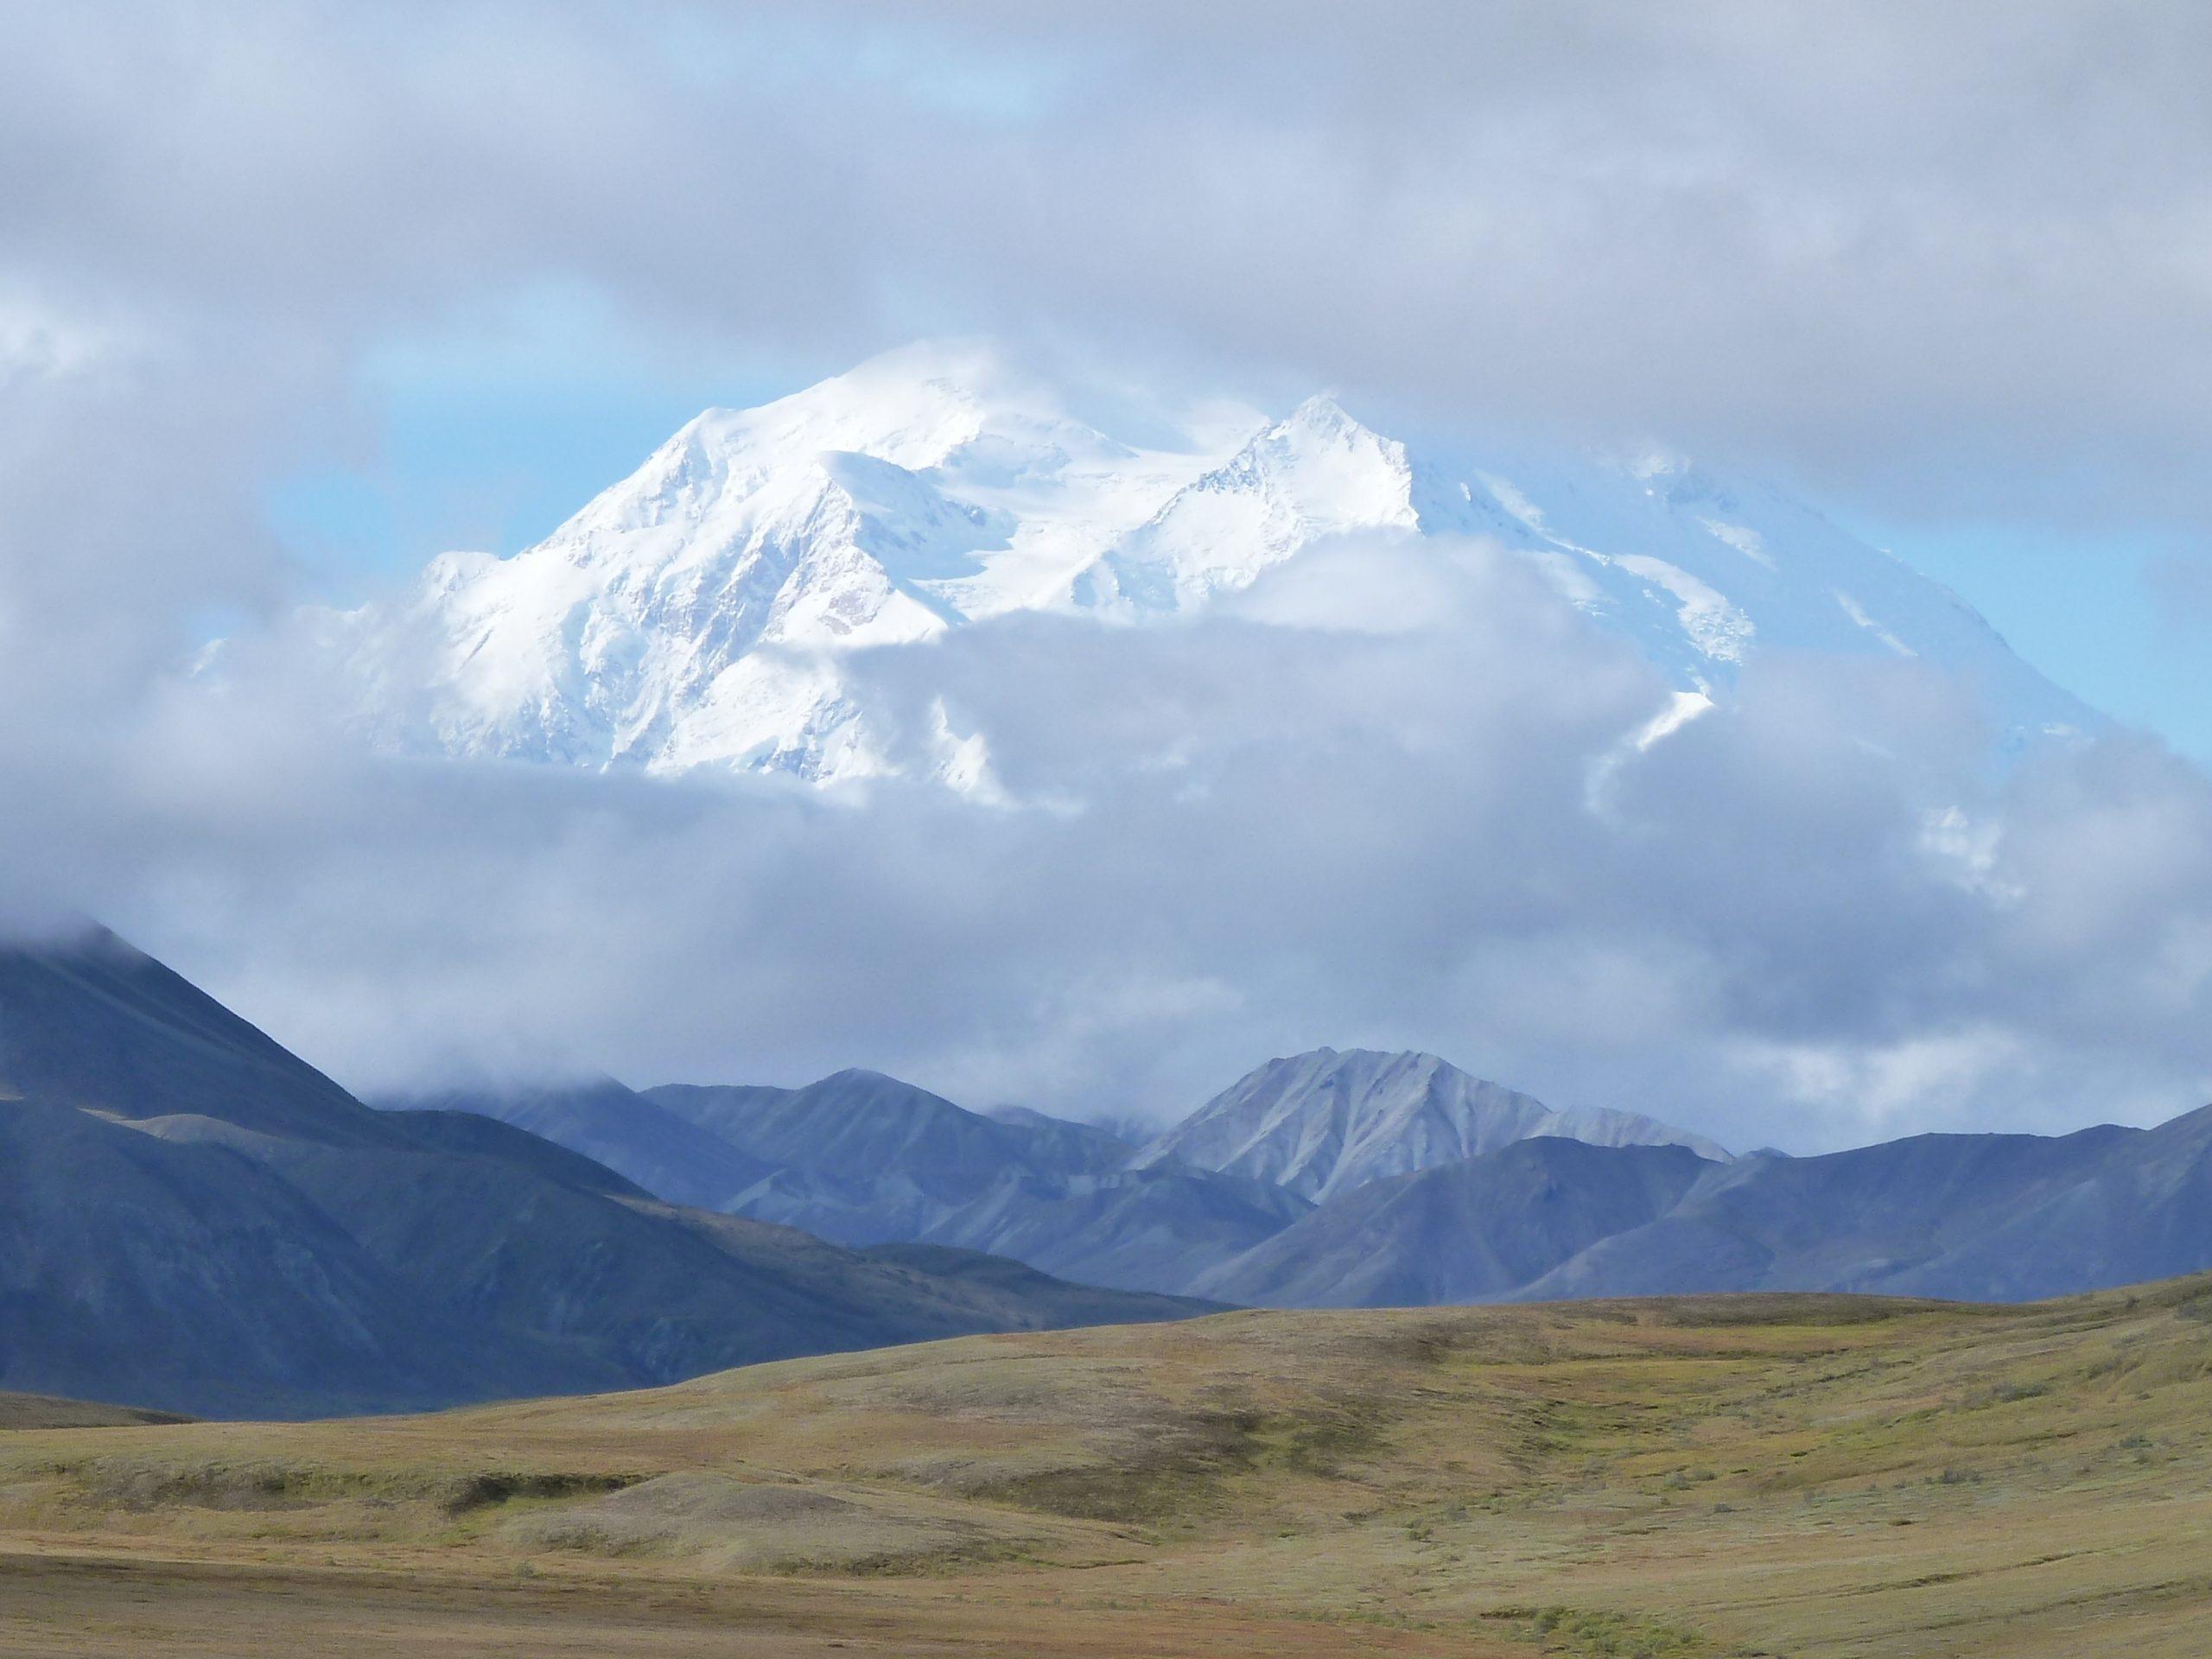 Radreise Alaska 2010 - Denali-NP - Denali (6.190m)